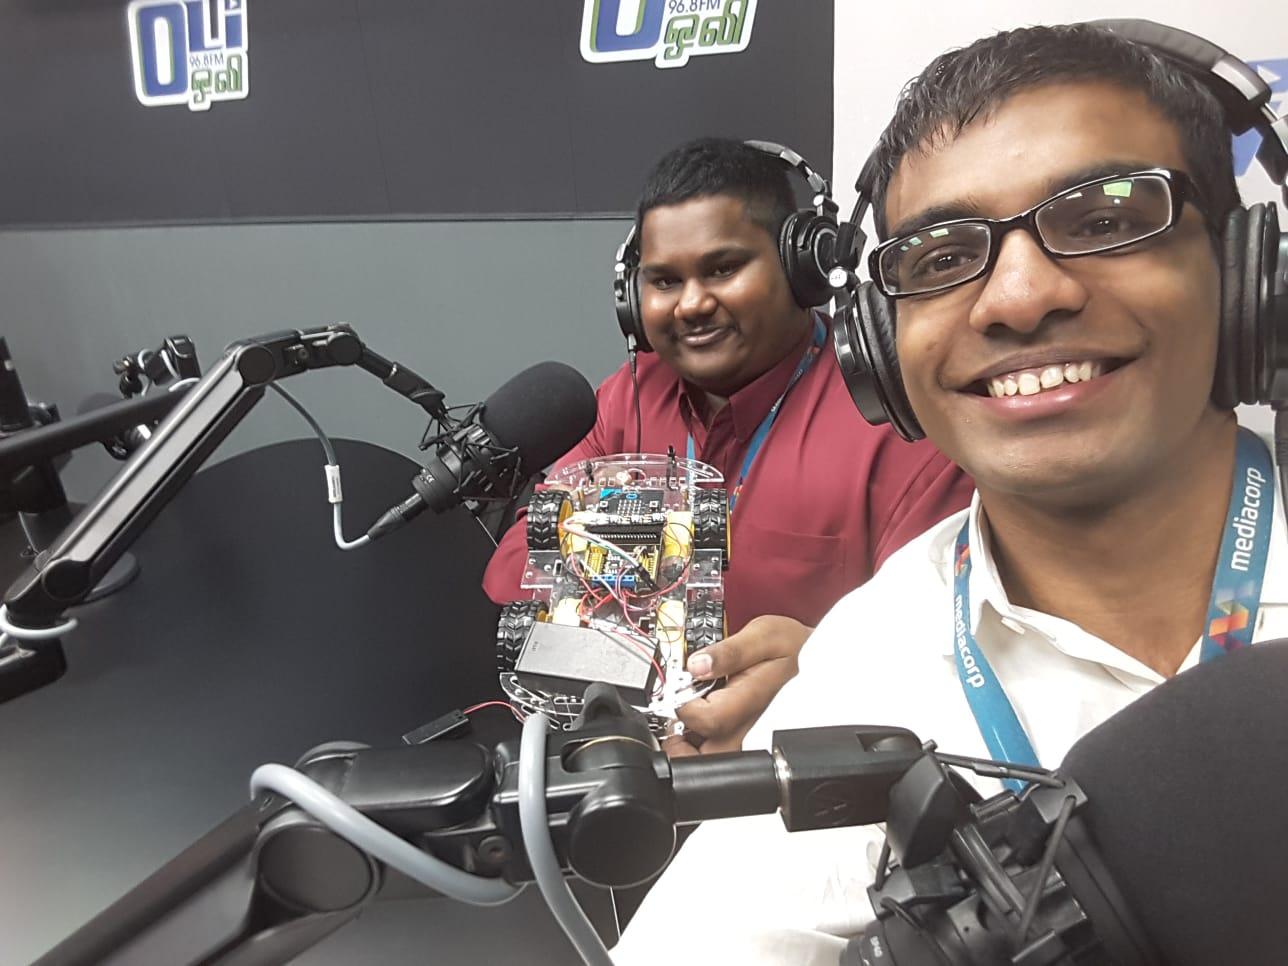 RADIO INTERVIEW OLI 96.8 FM.jpeg